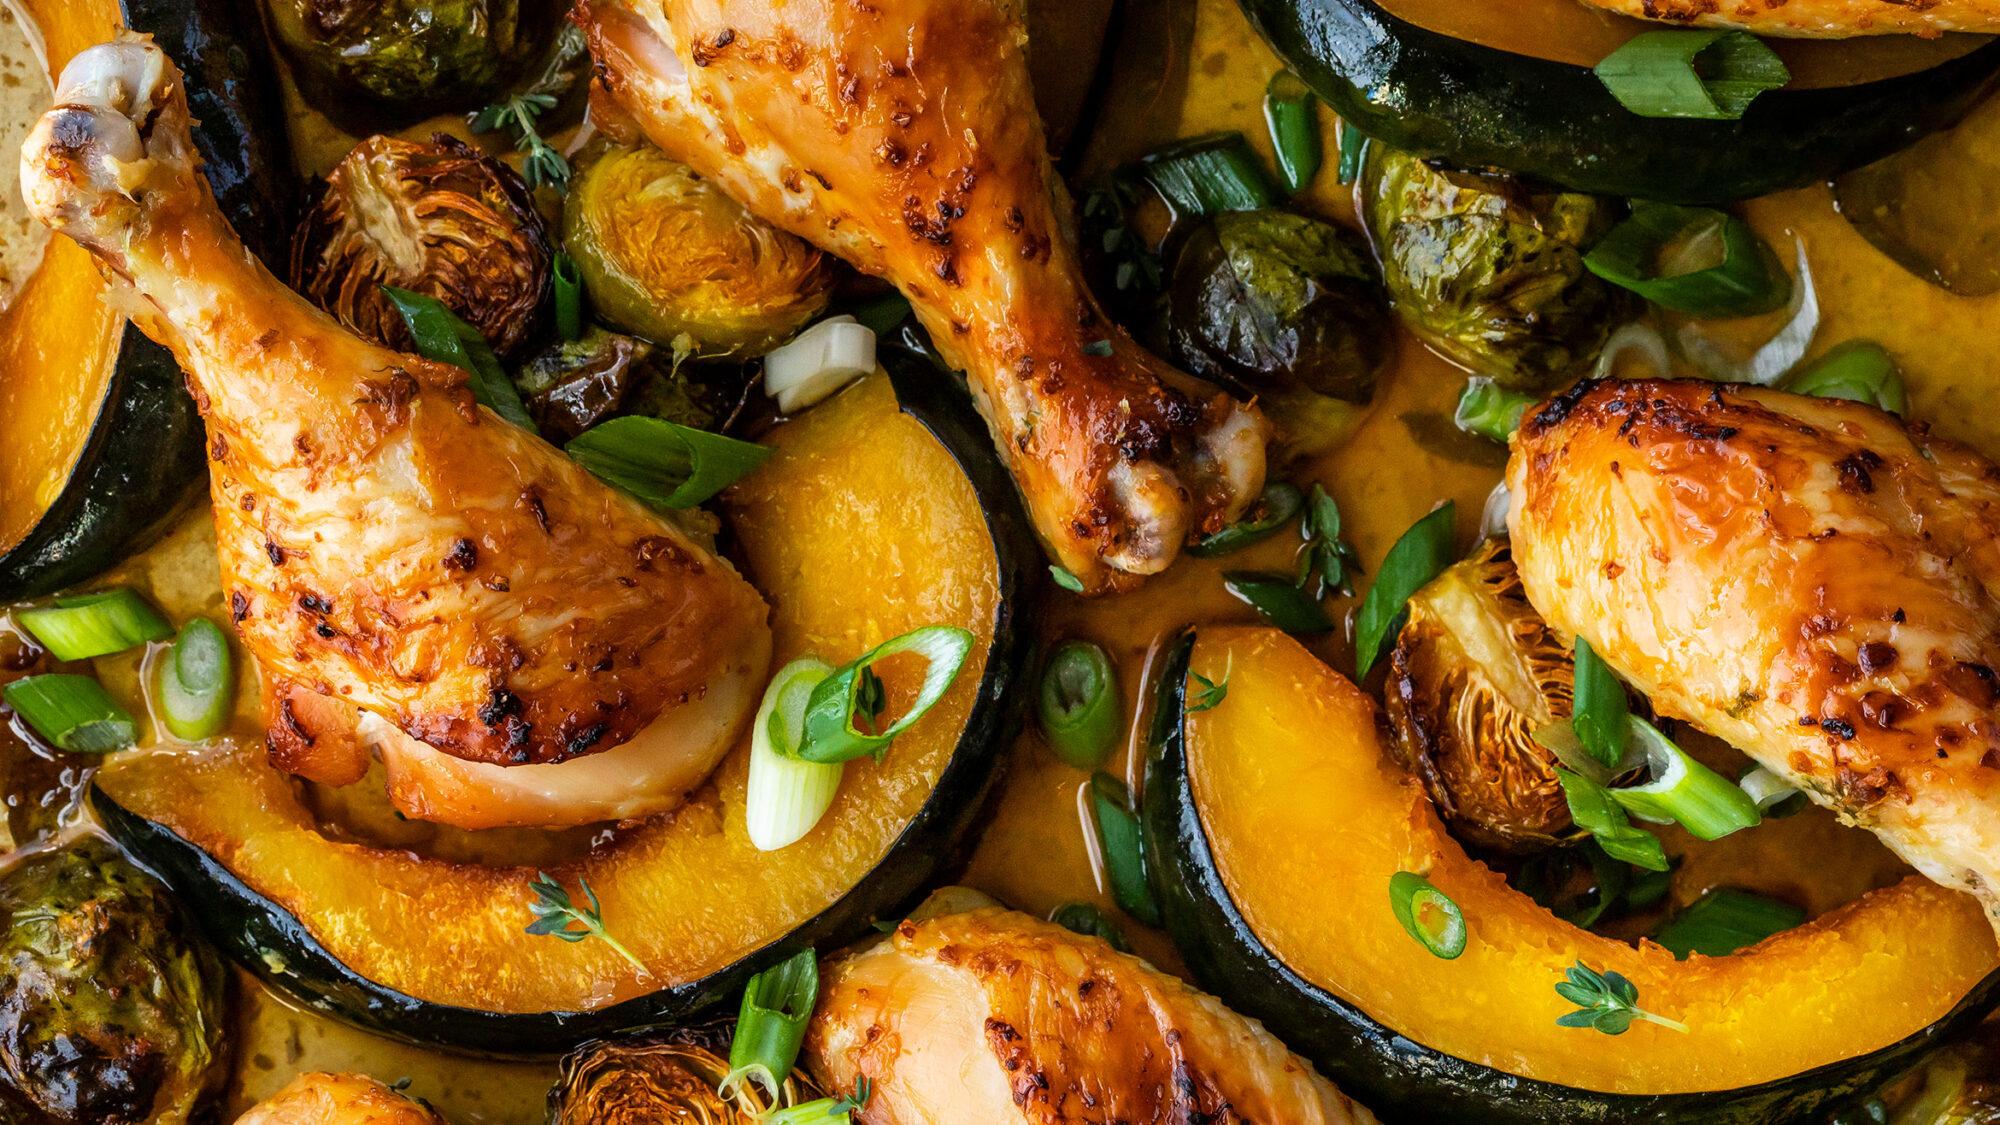 Article-Cathy-Erway-Sheet-Pan-Chicken-Drumsticks-Recipe